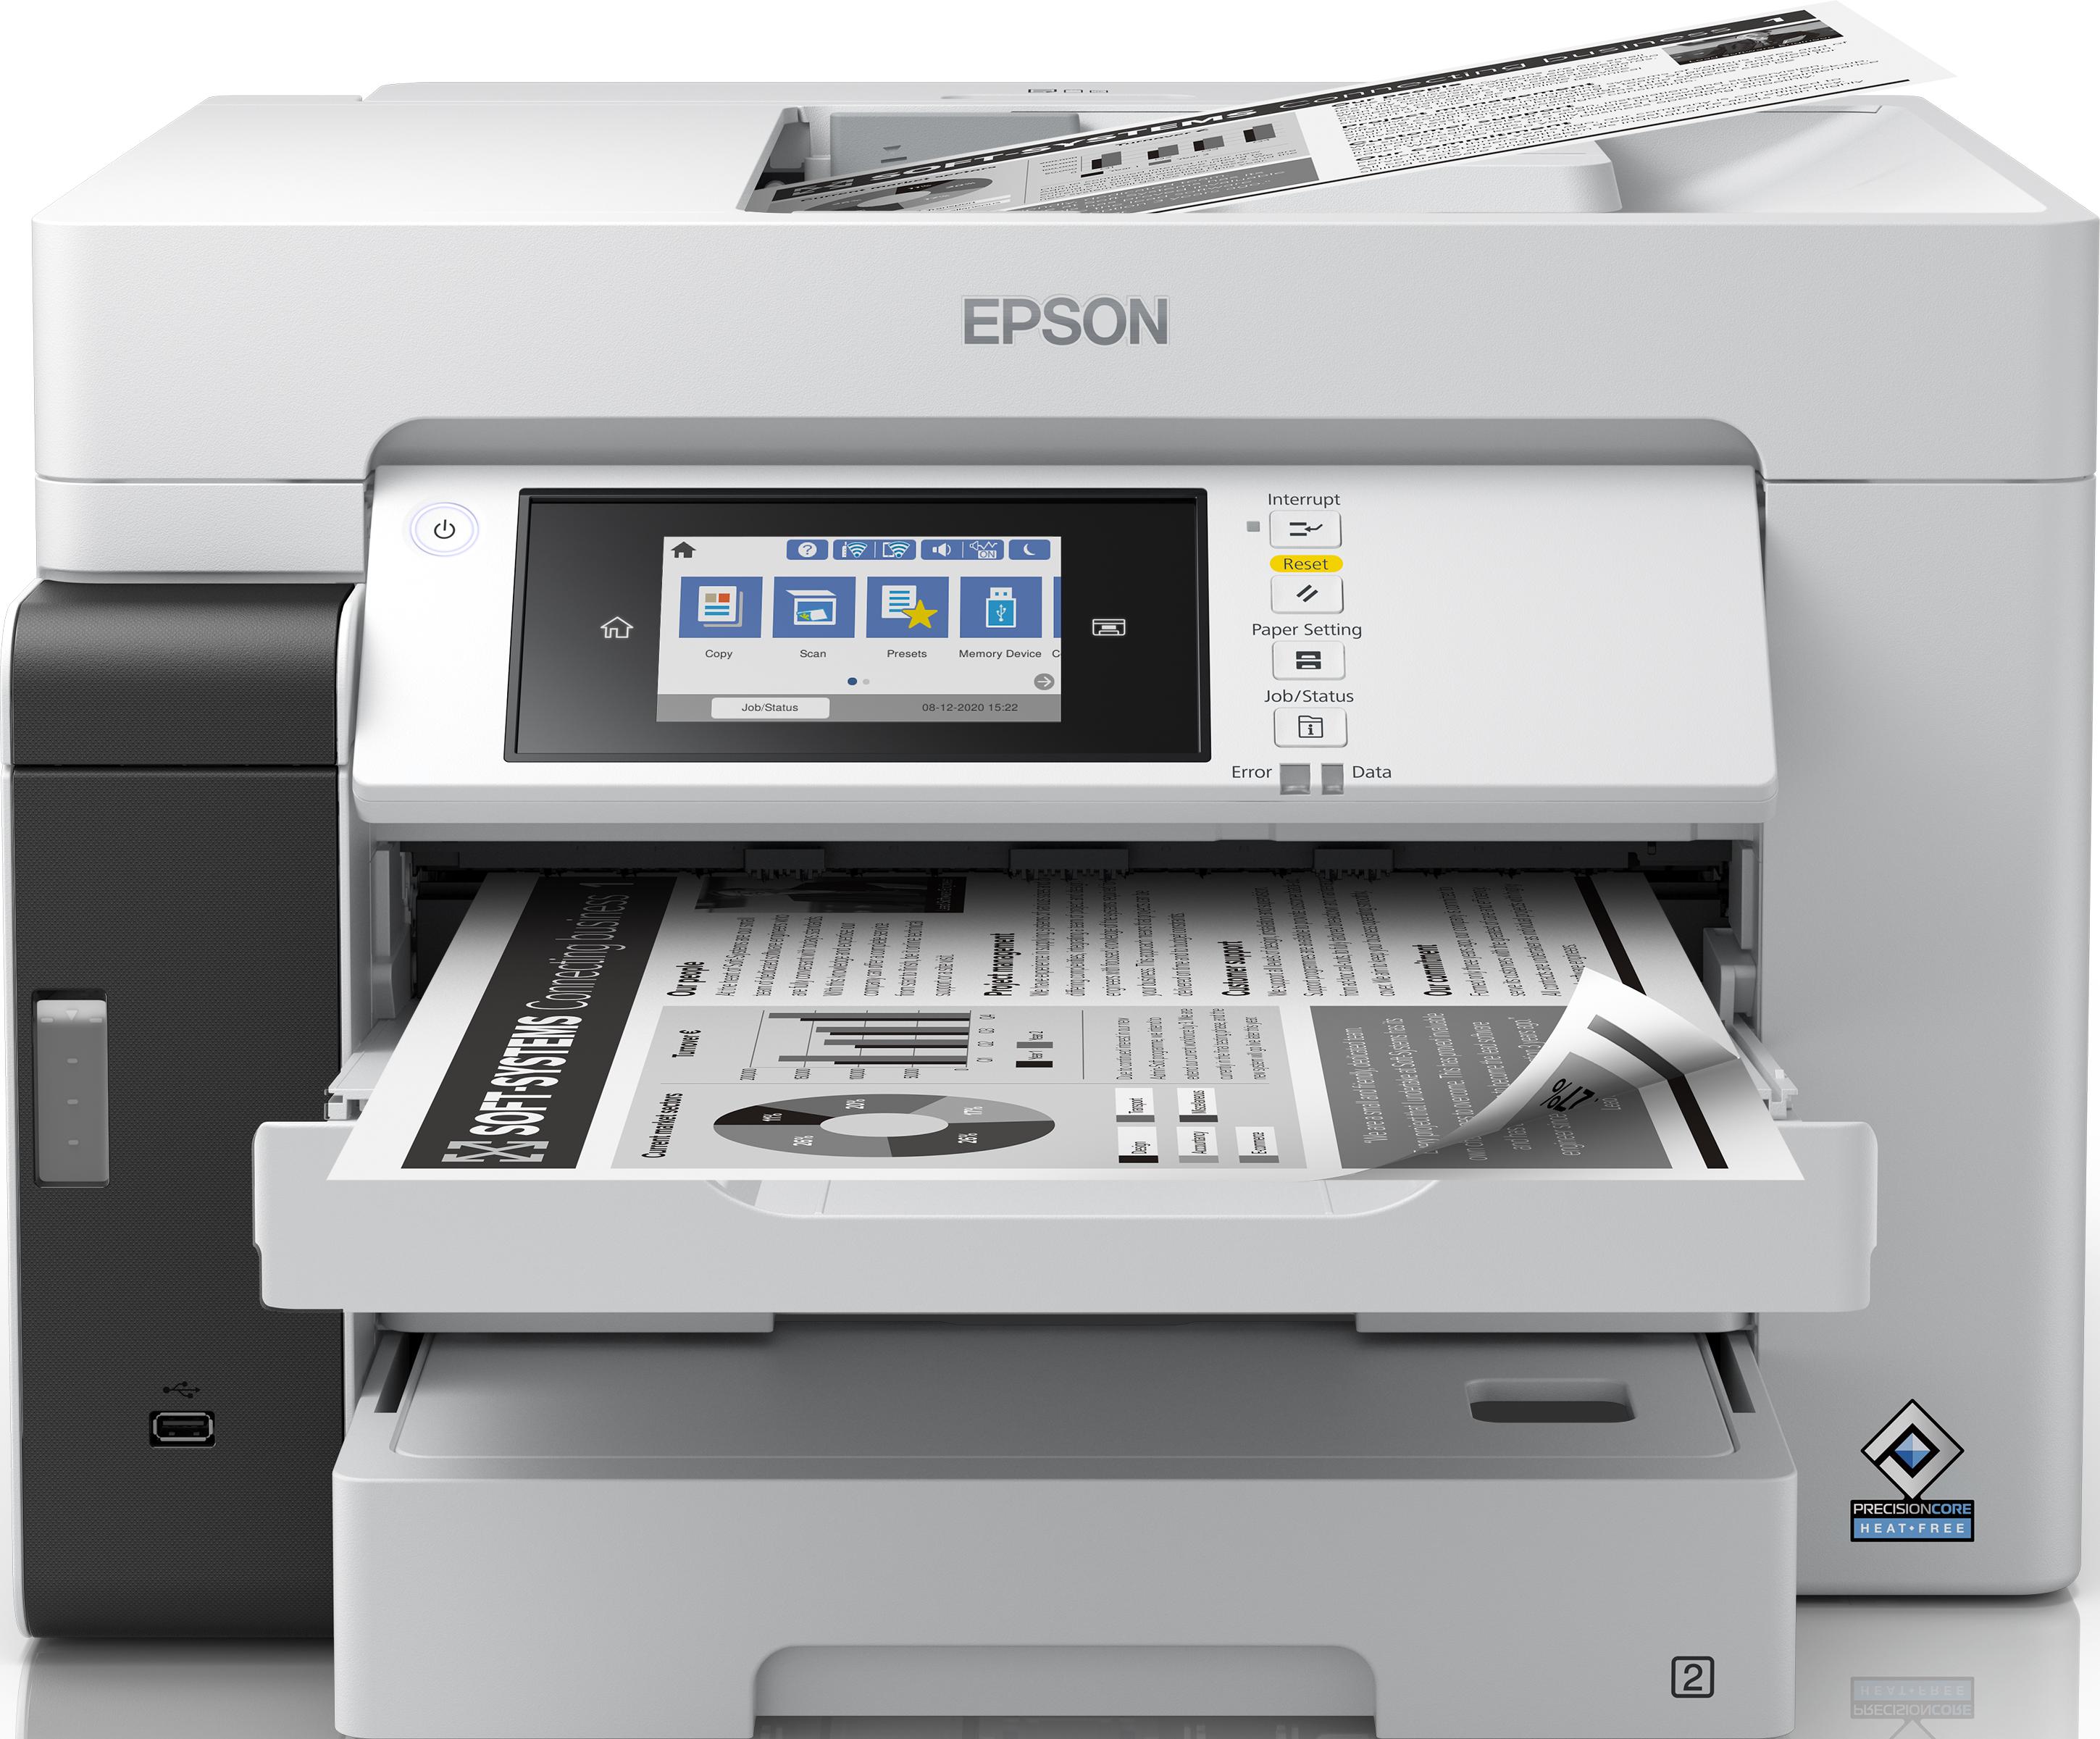 Epson EcoTank Pro M15180